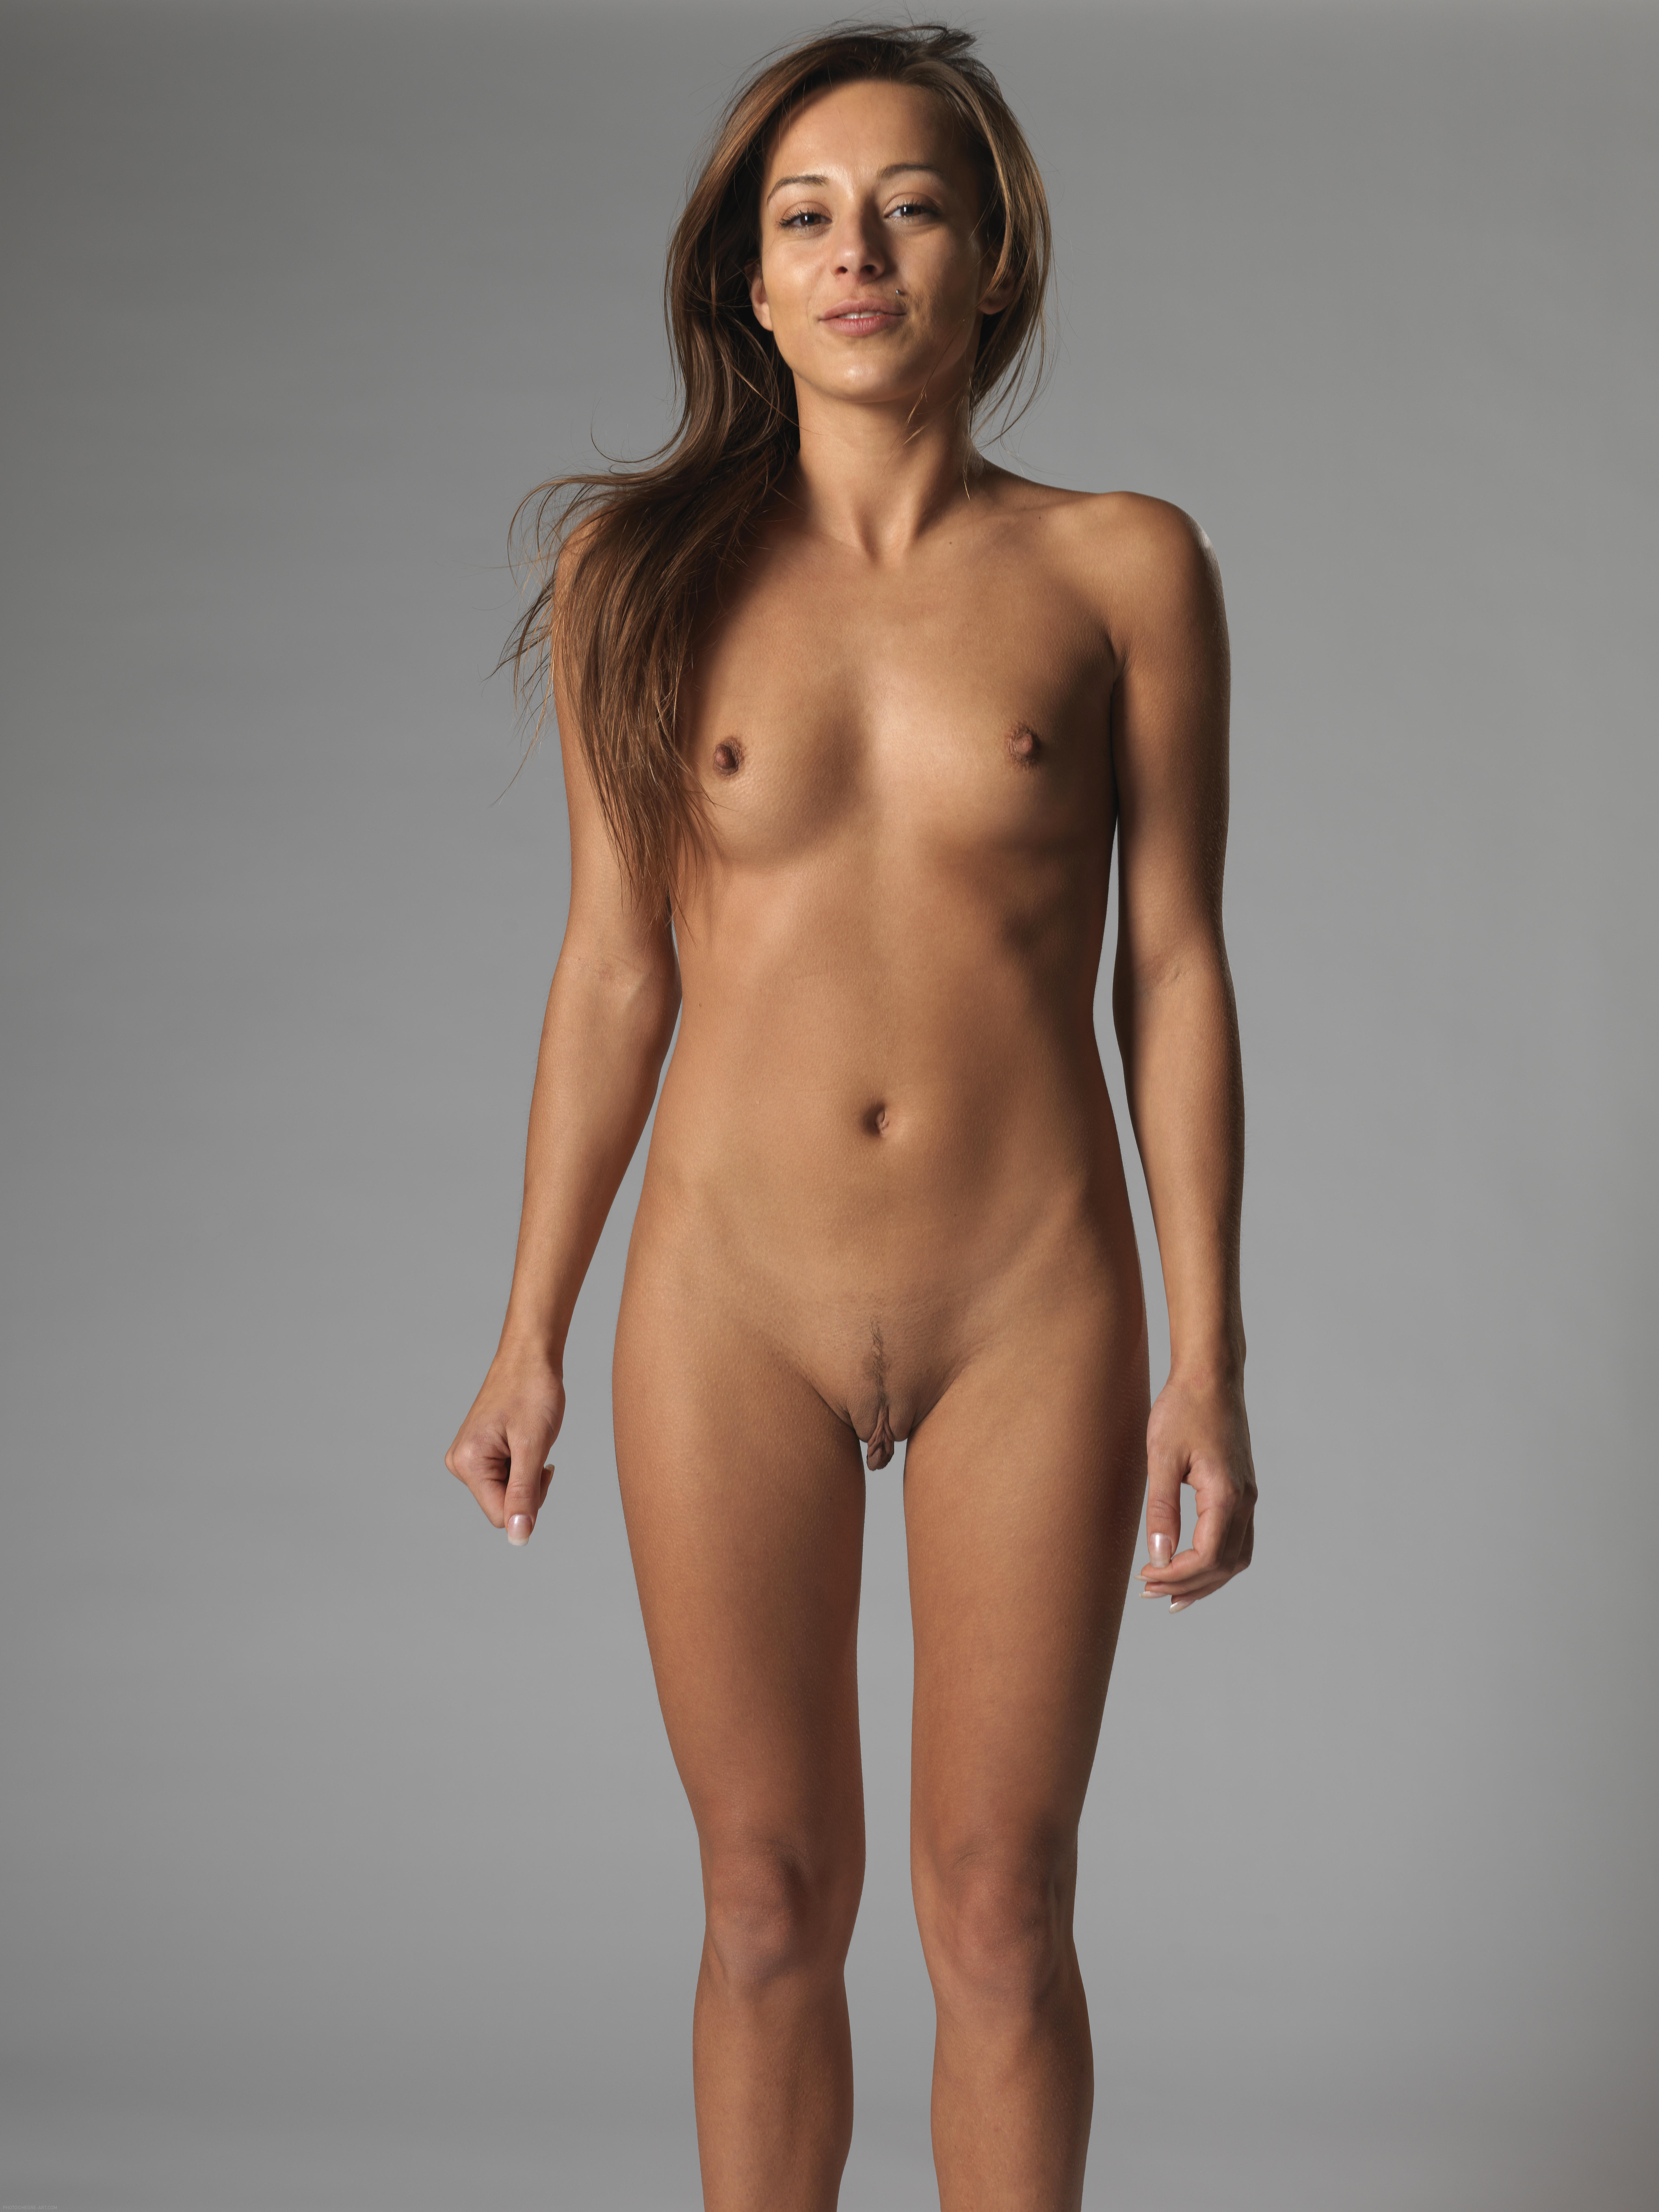 nackt naked nakken nude verbs engage